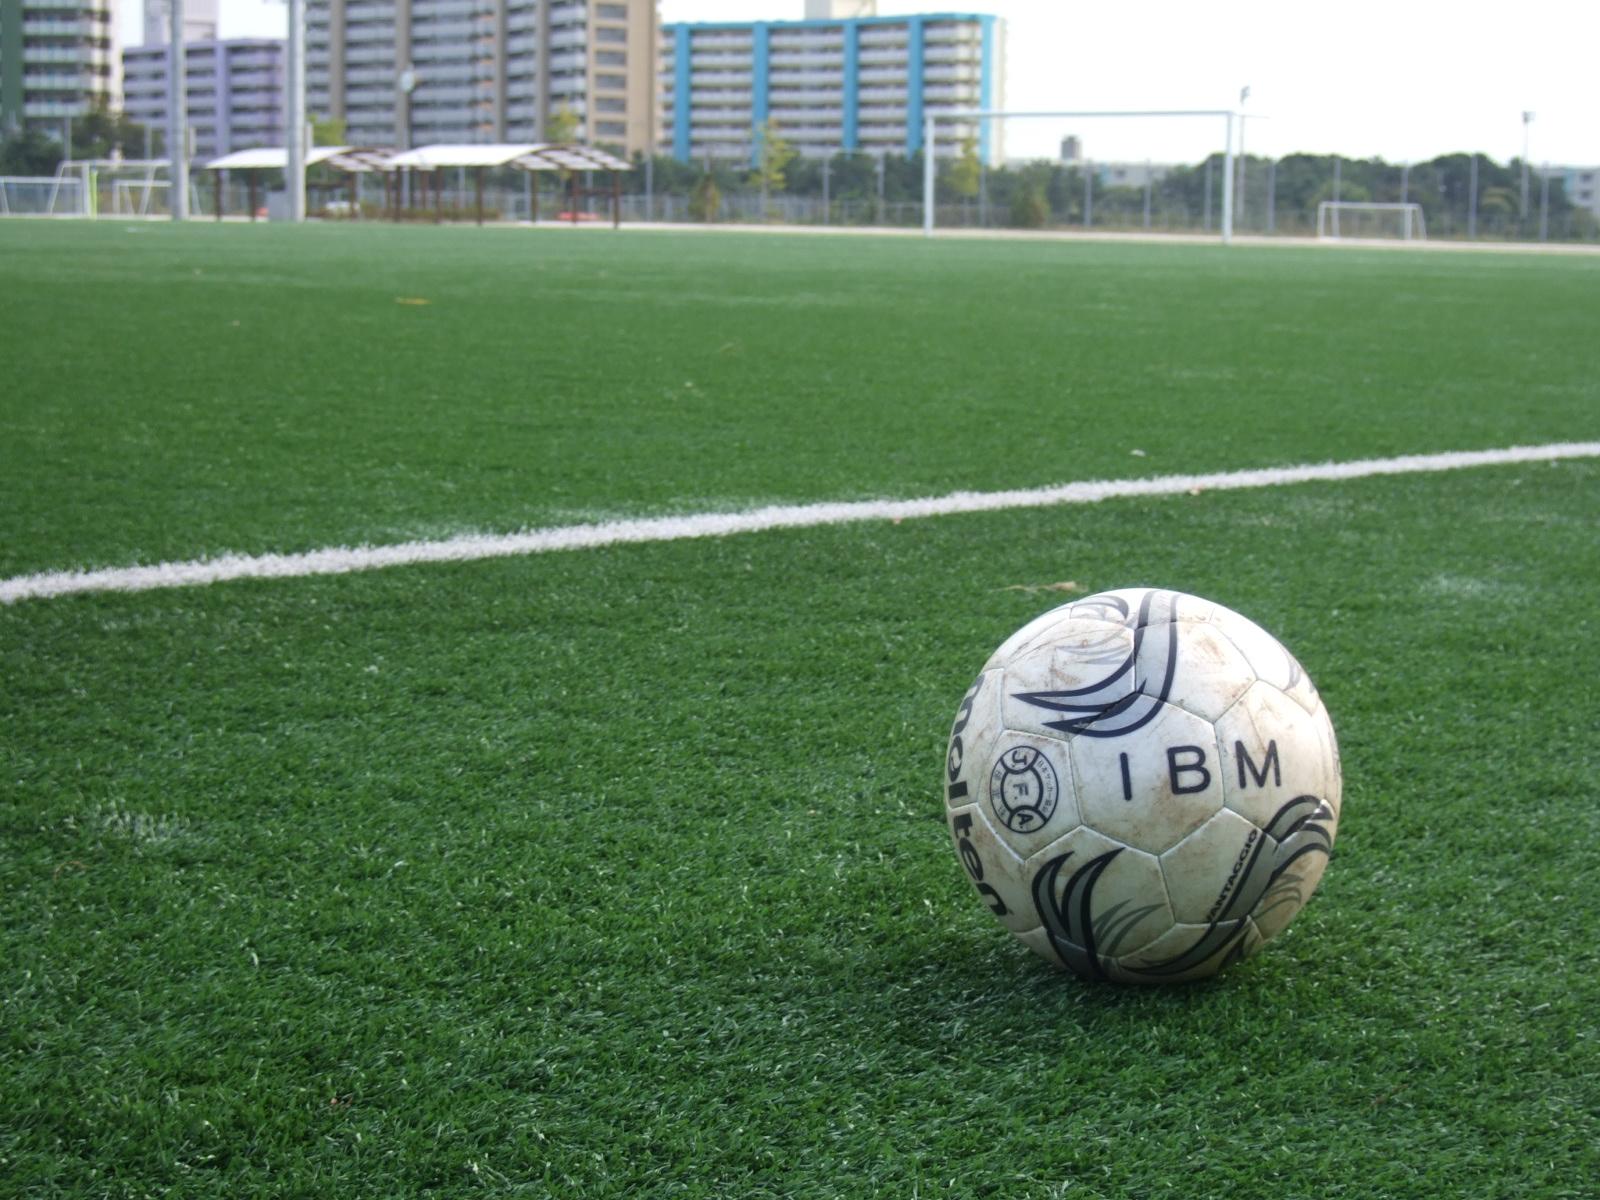 Dscf3840 IBMサッカー部 部員一同 ■■2008年度東京都社会人リーグサッカー...